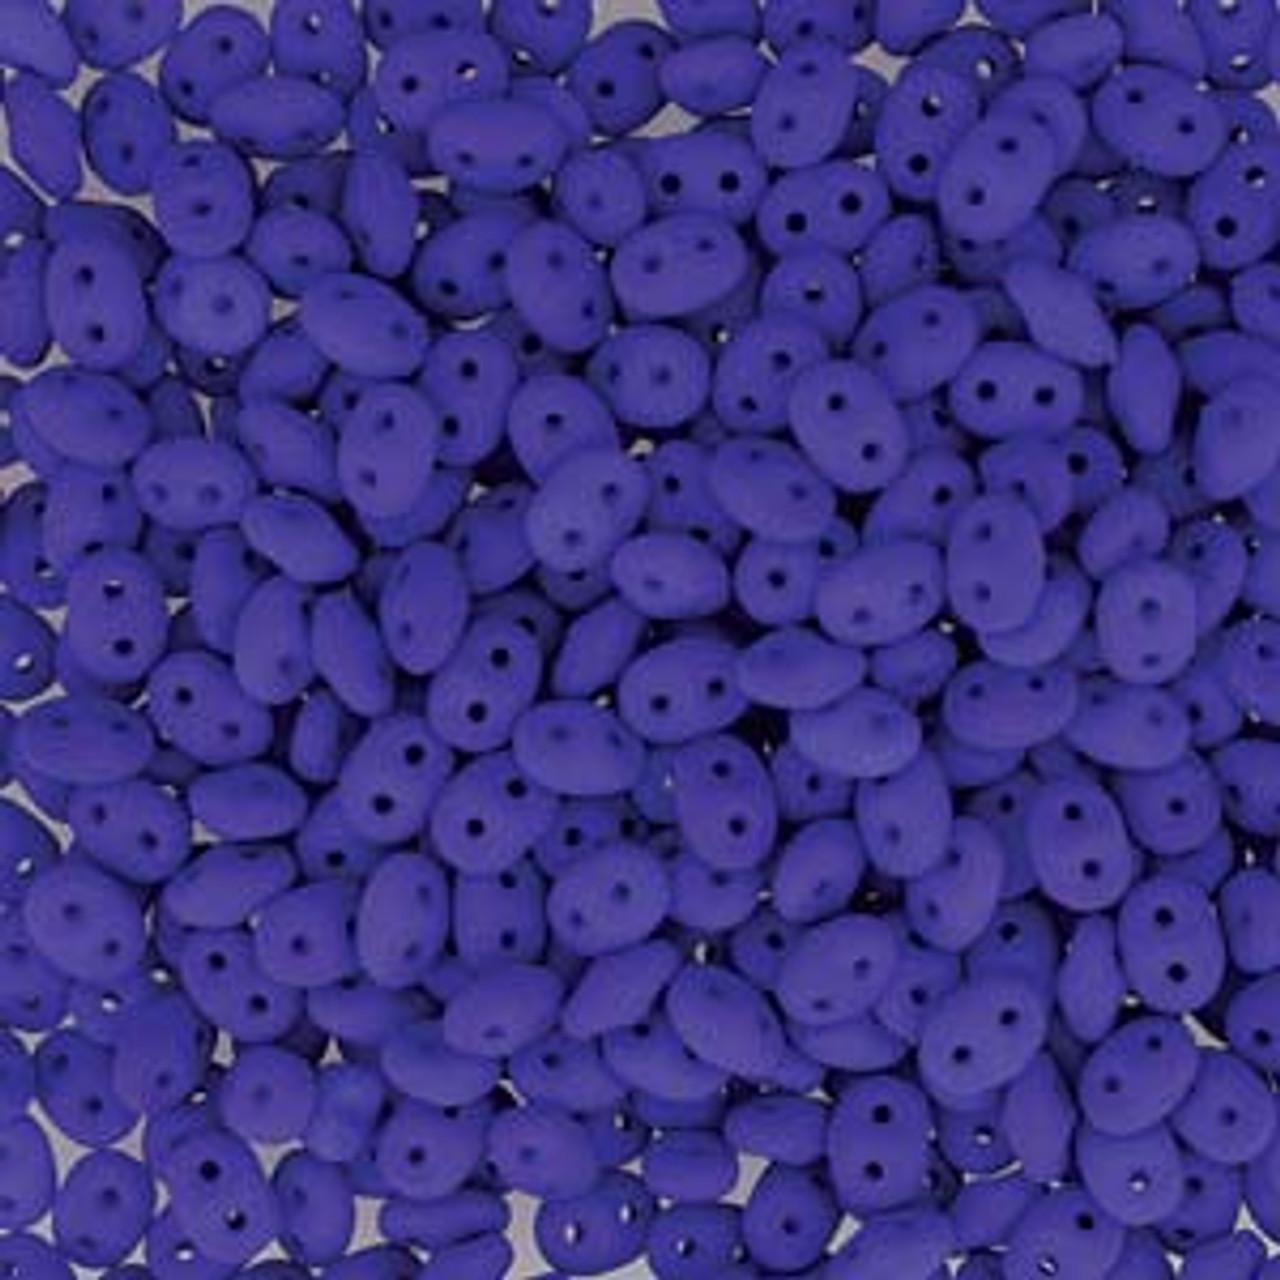 Neon Blue Super Duo Beads - 8 Grams